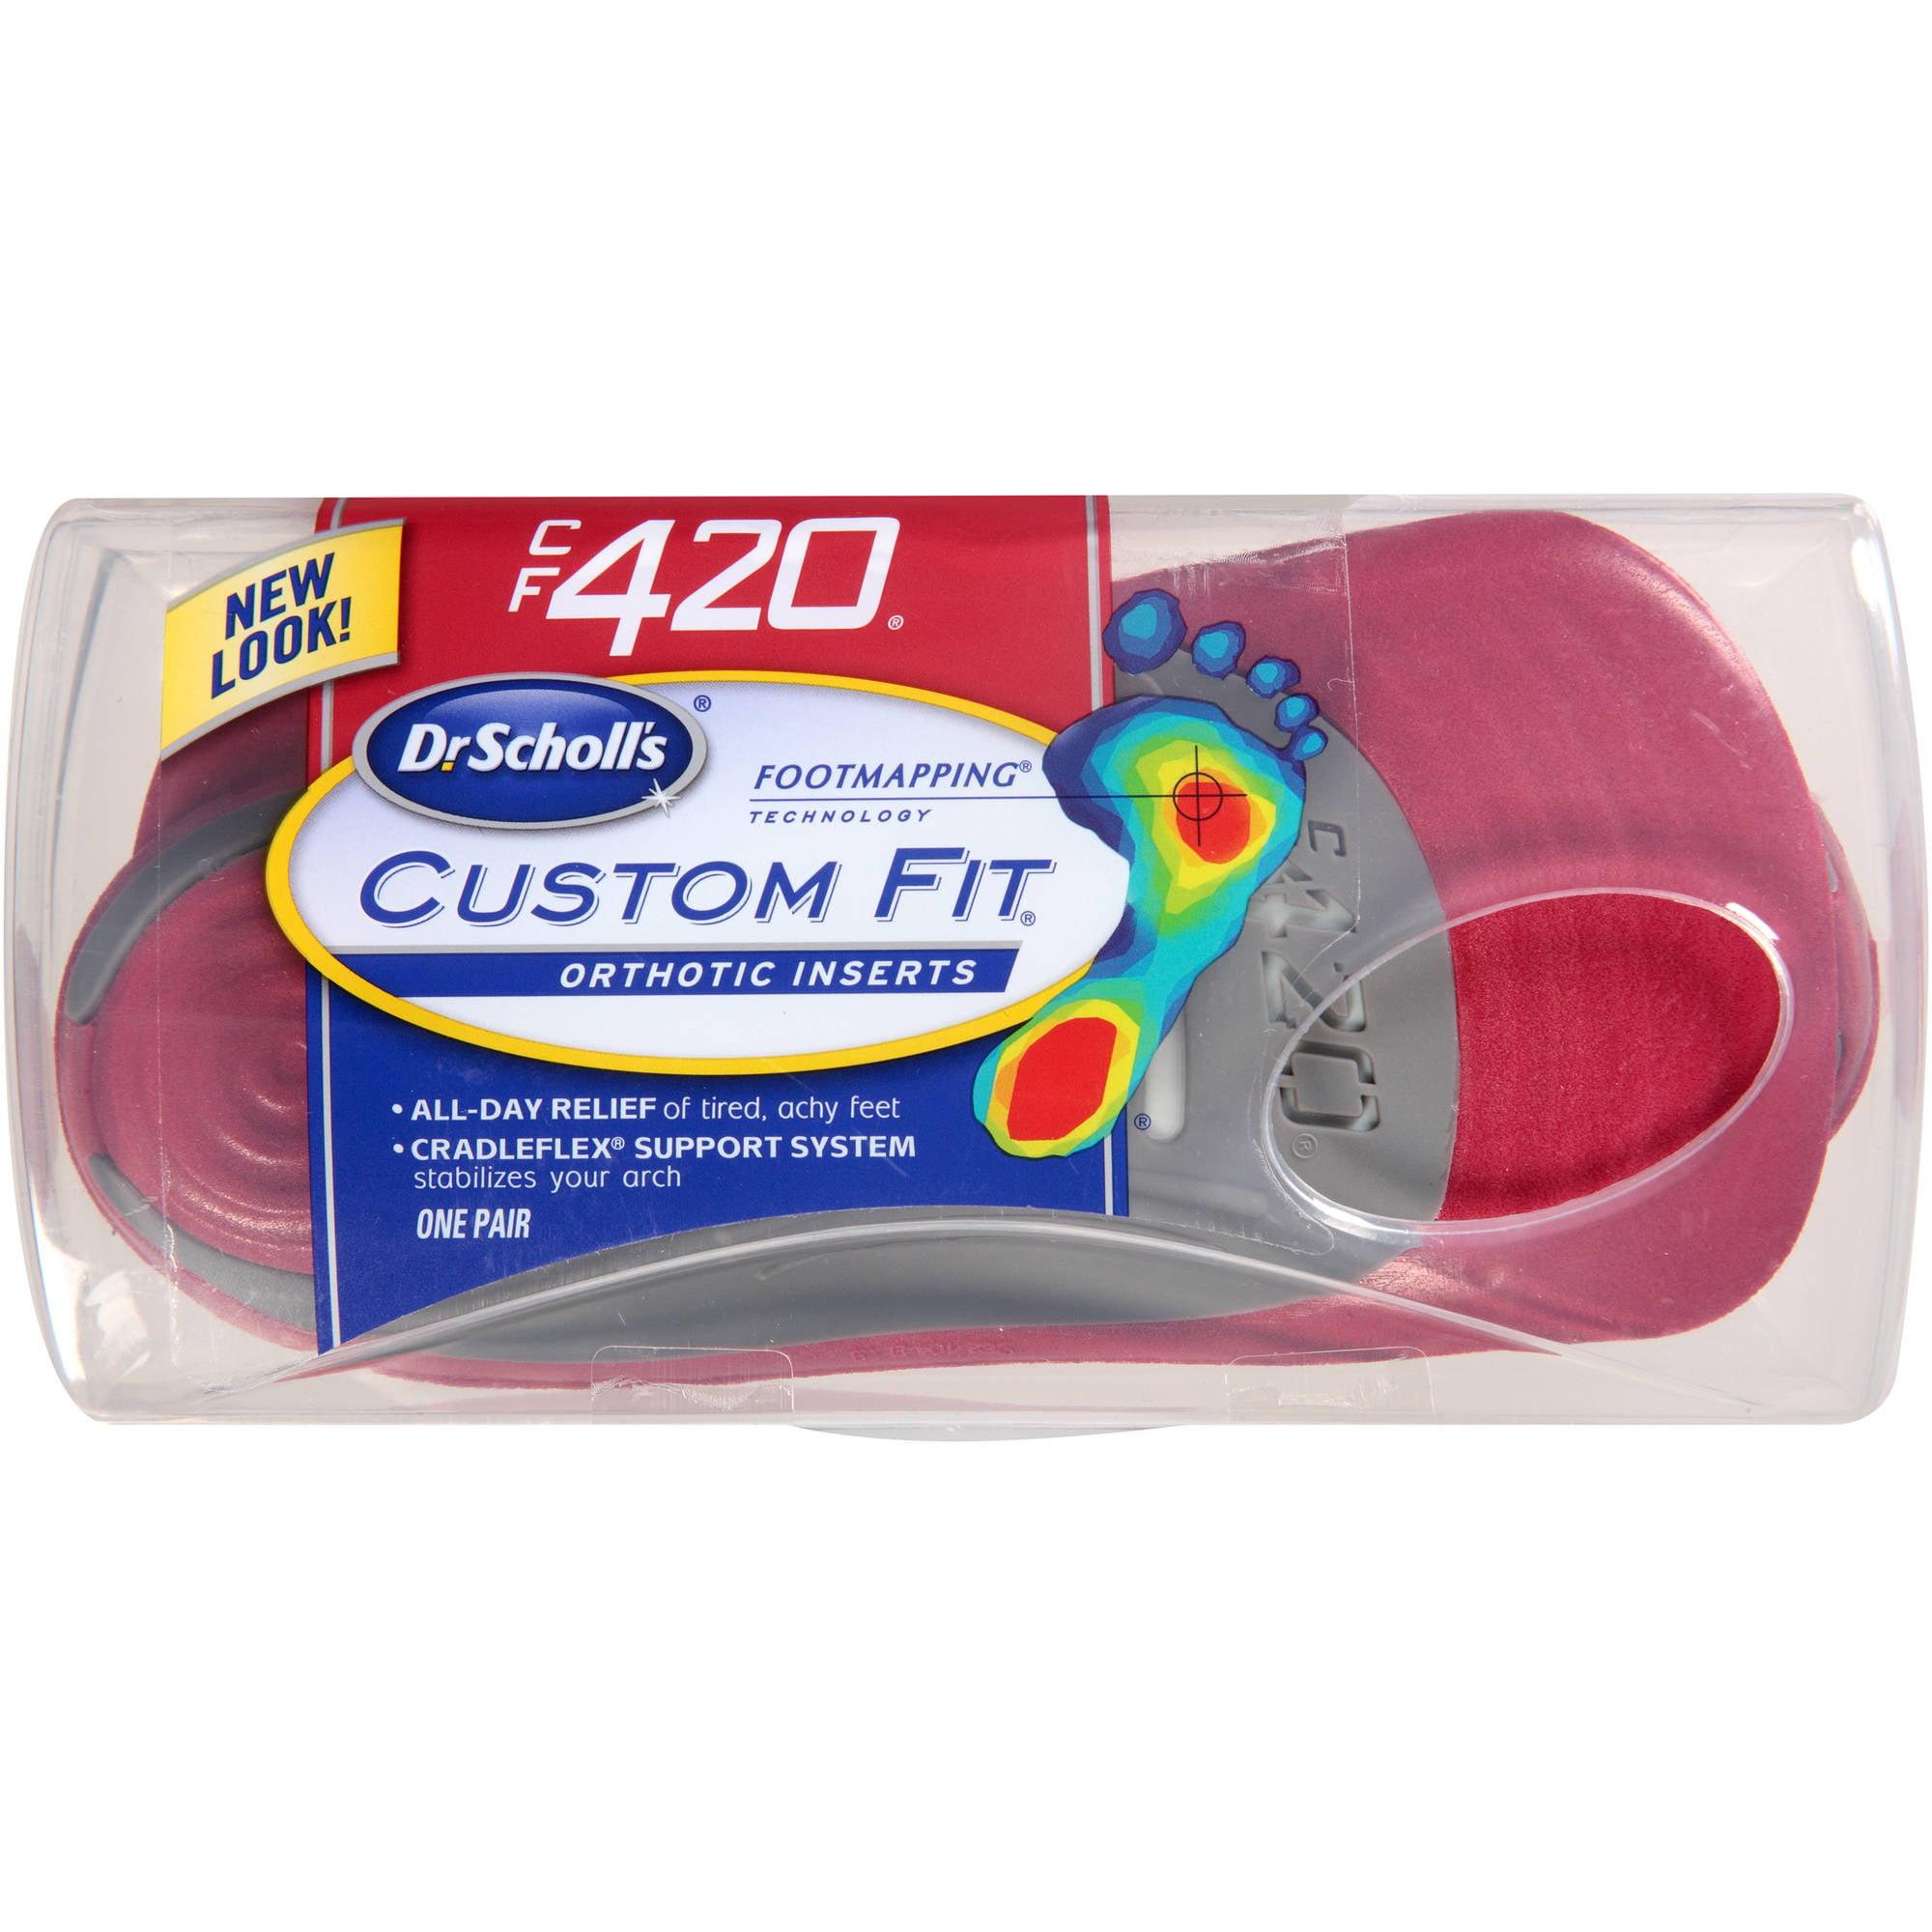 Dr. Scholl's Custom Fit CF420 Orthotic Inserts, 1 pr